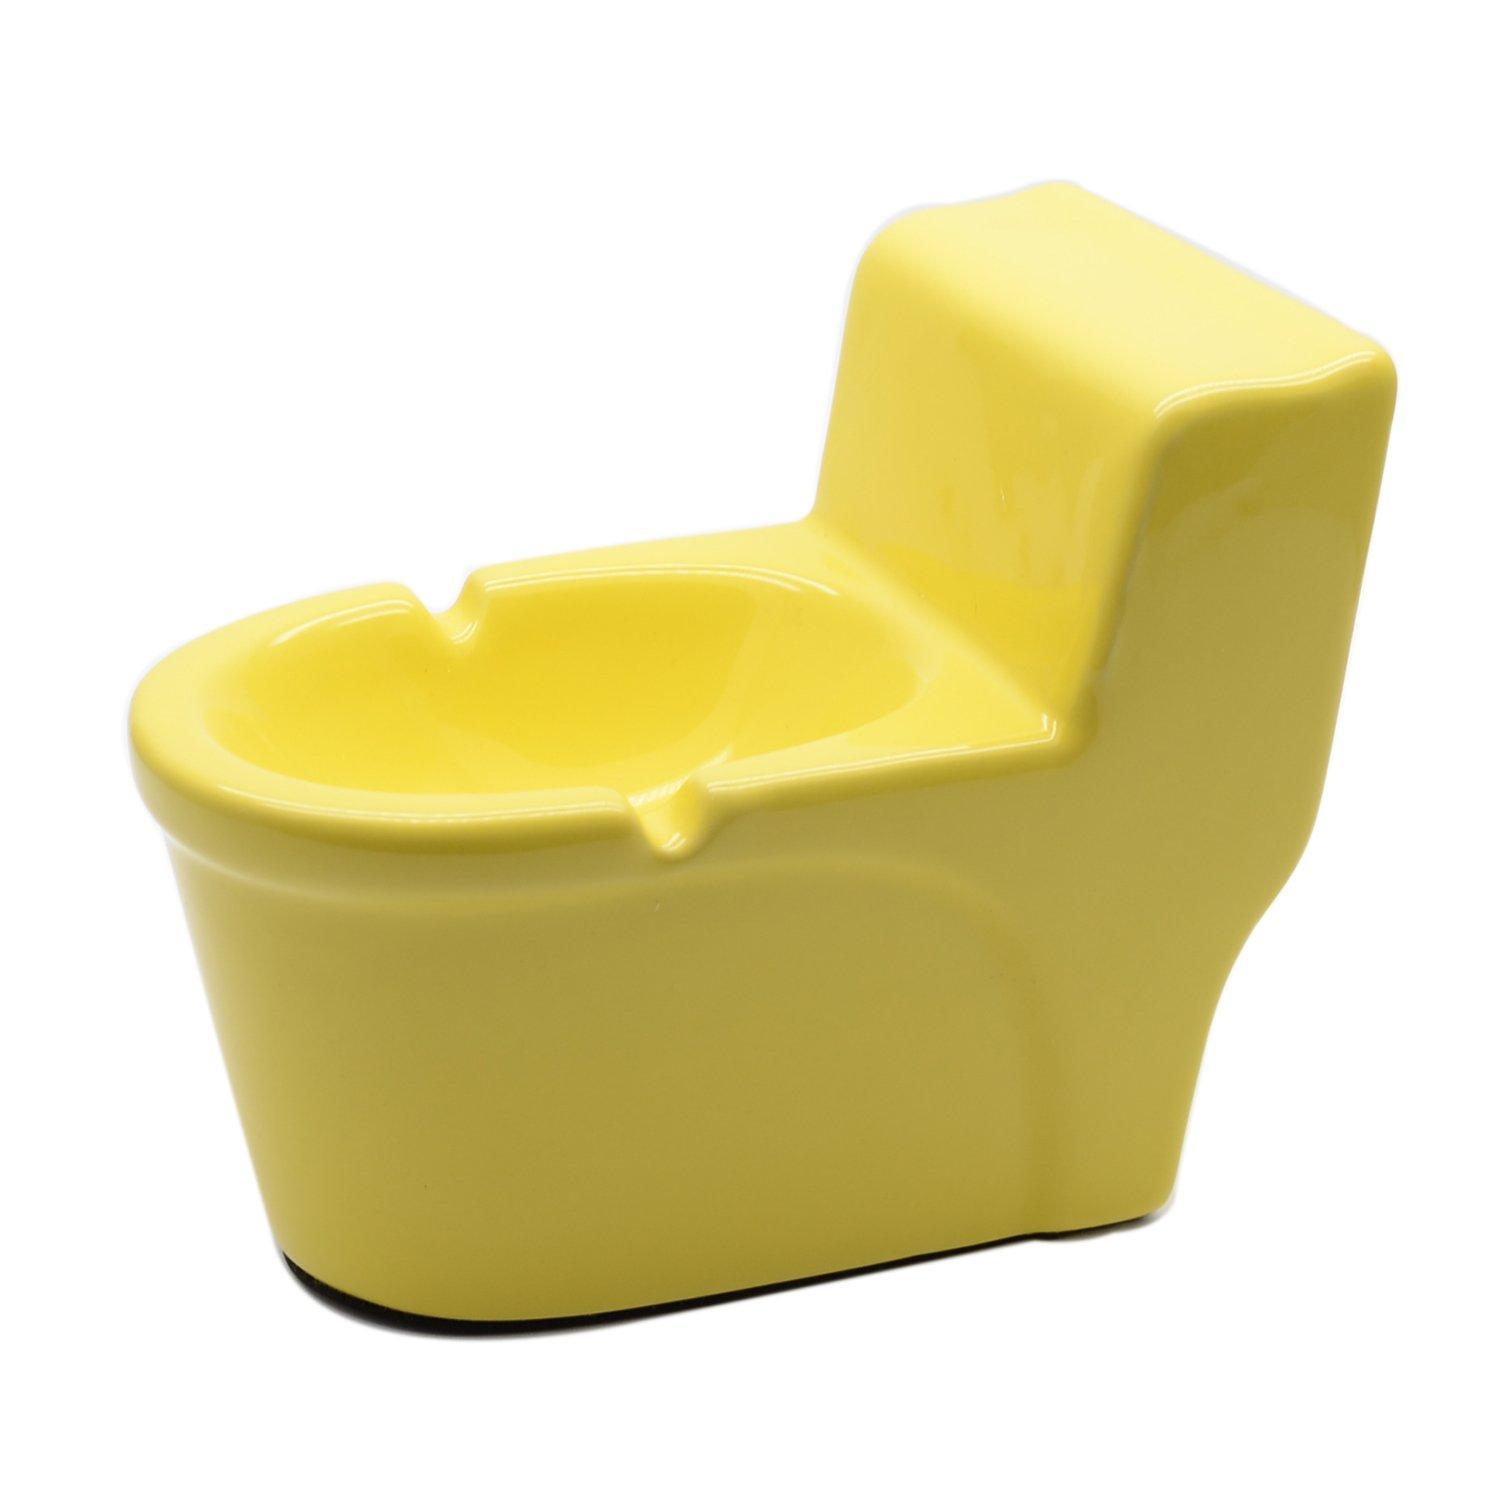 TOWOMO Creative Closestool Shape Ceramic Cigarette Ashtray (Yellow)